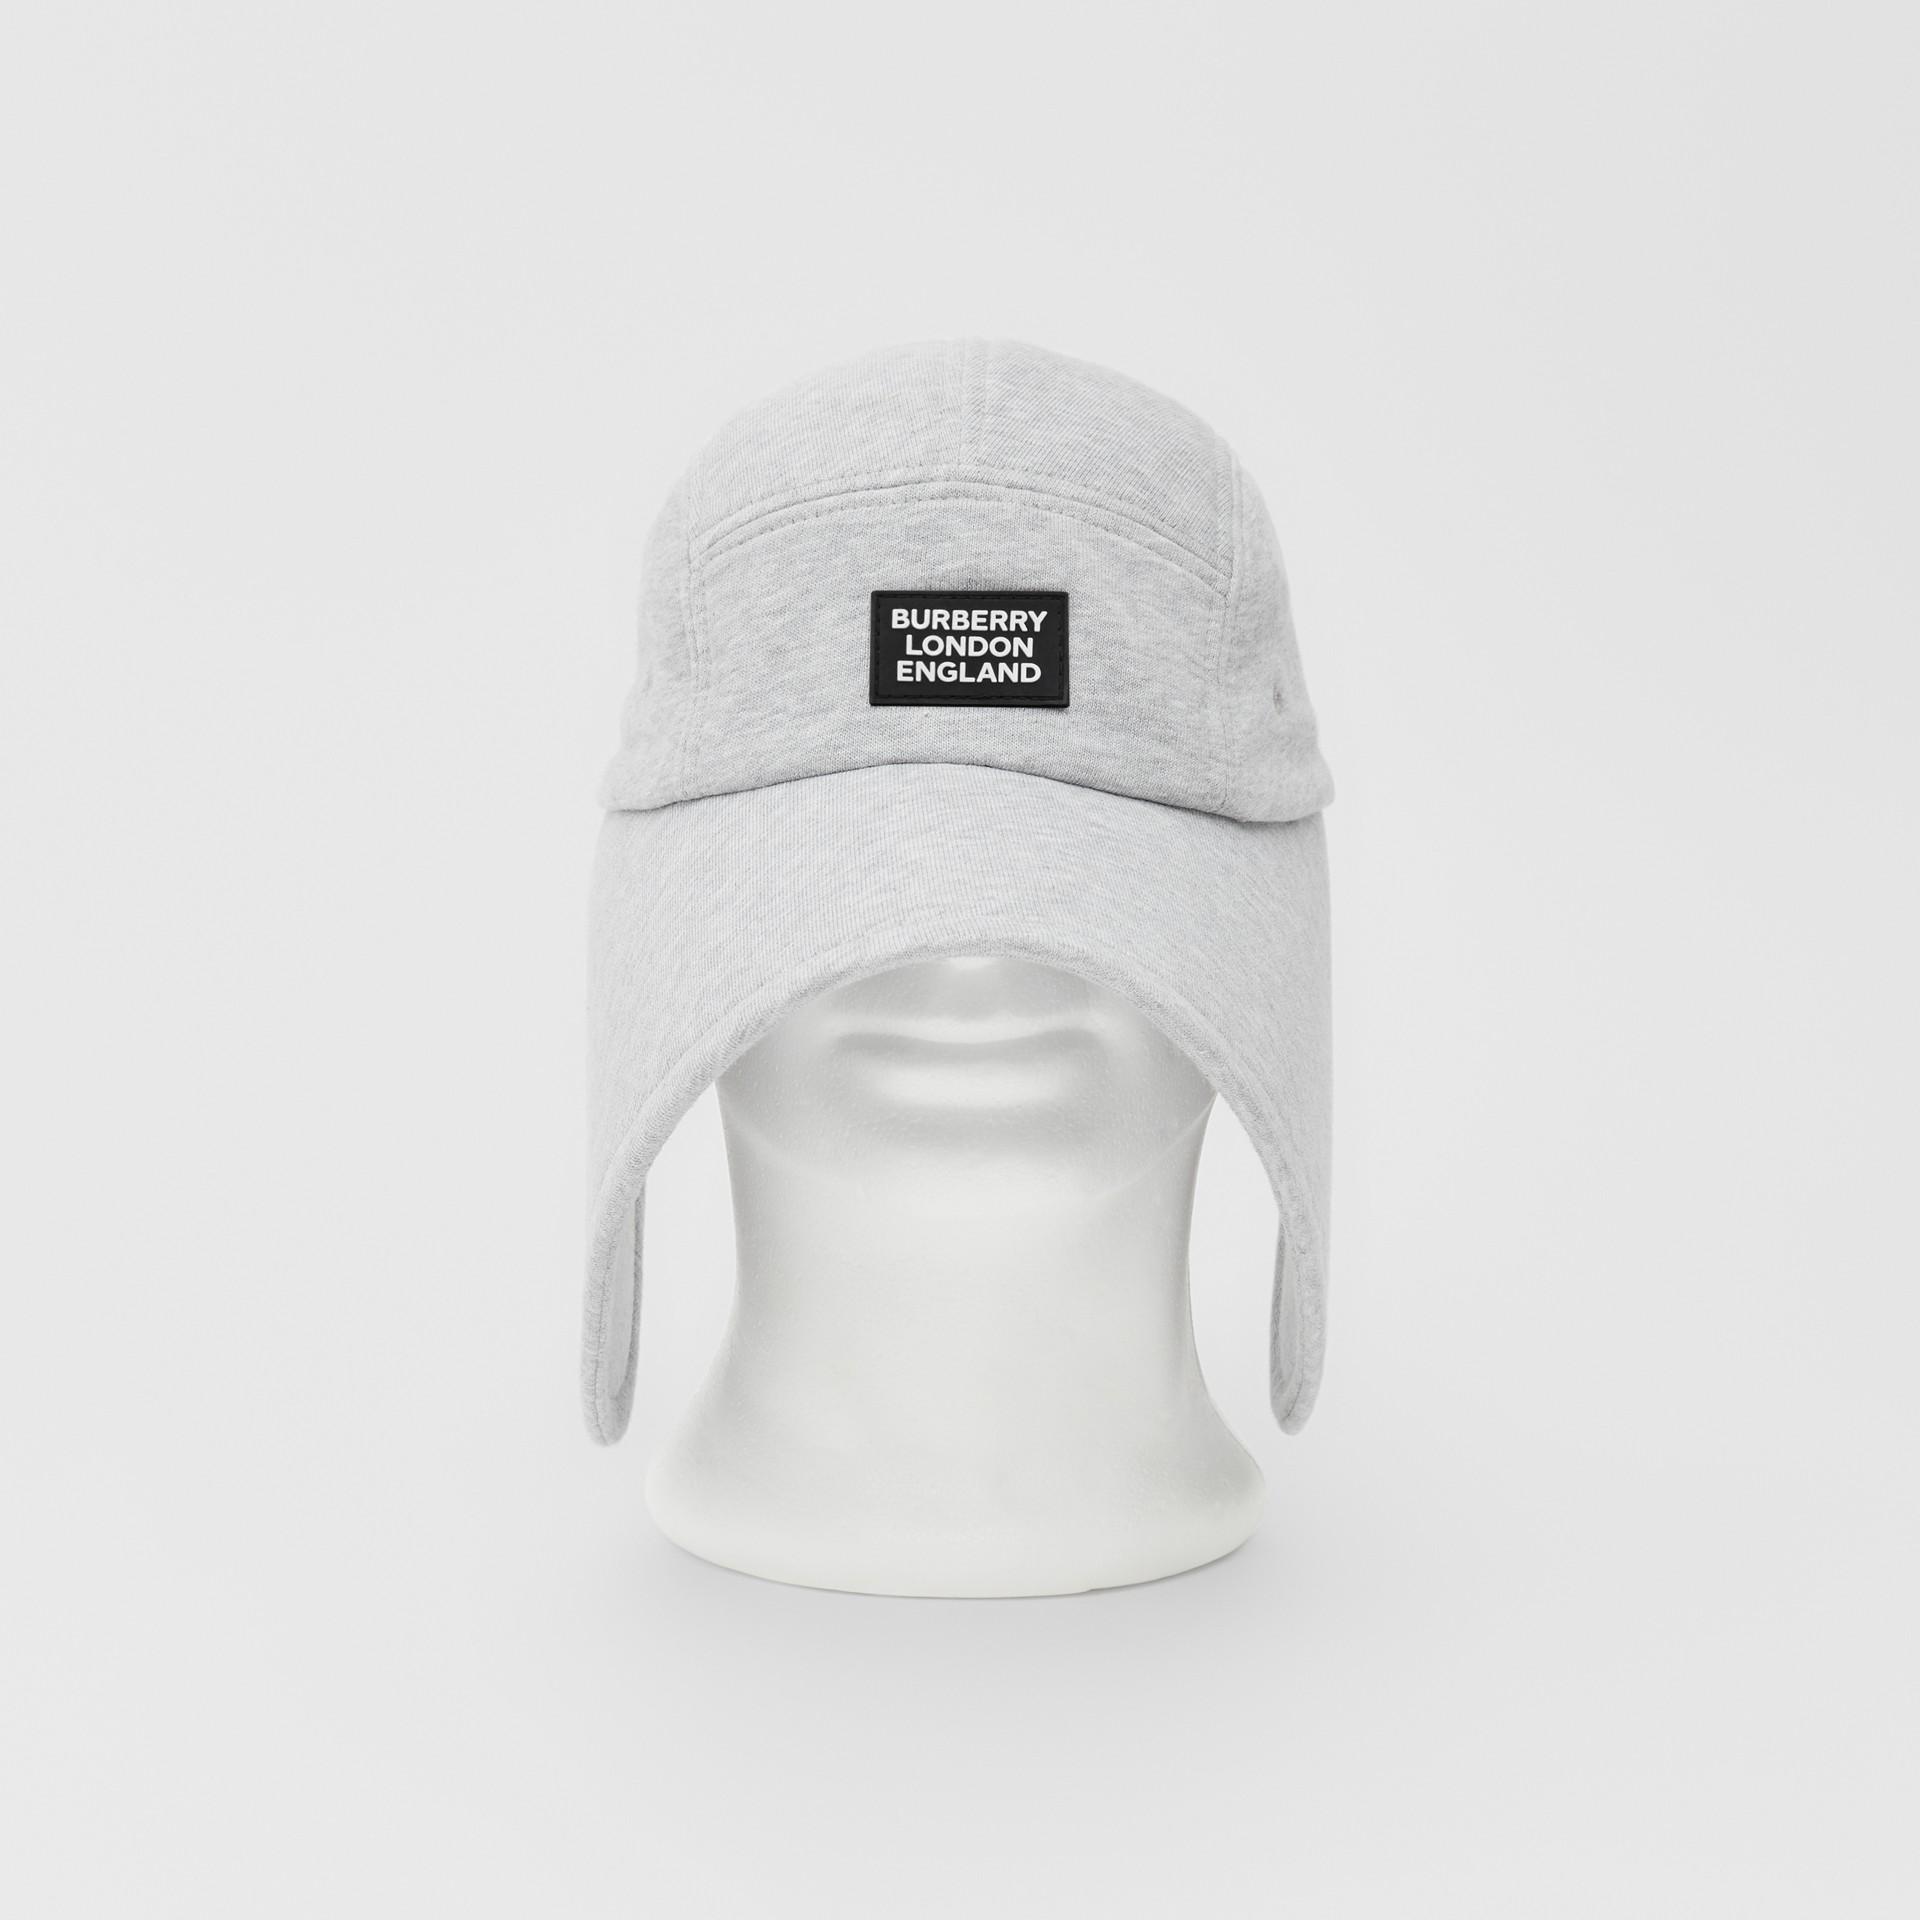 Logo Appliqué Cotton Jersey Bonnet Cap in Light Pebble Grey | Burberry - gallery image 0